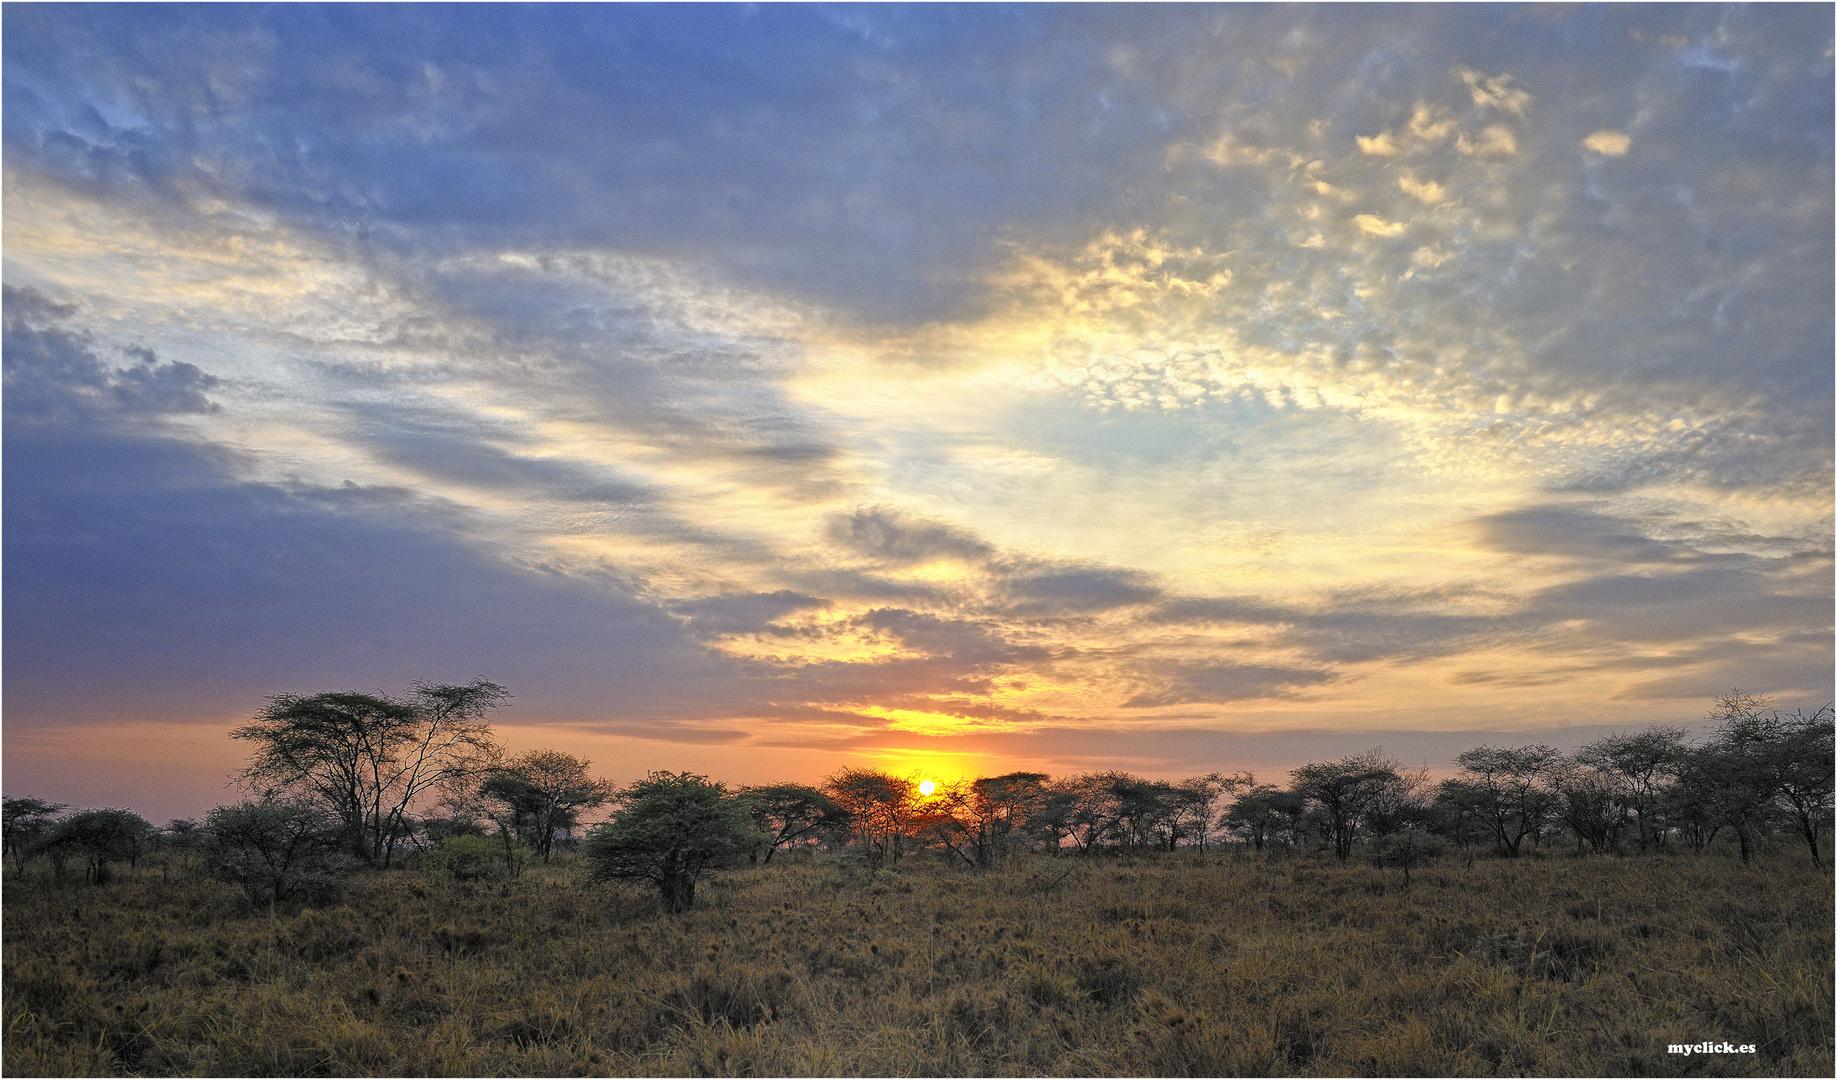 MEMORIAS DE AFRICA - ATARDECER EN EL SERENGUETI- TANZANIA